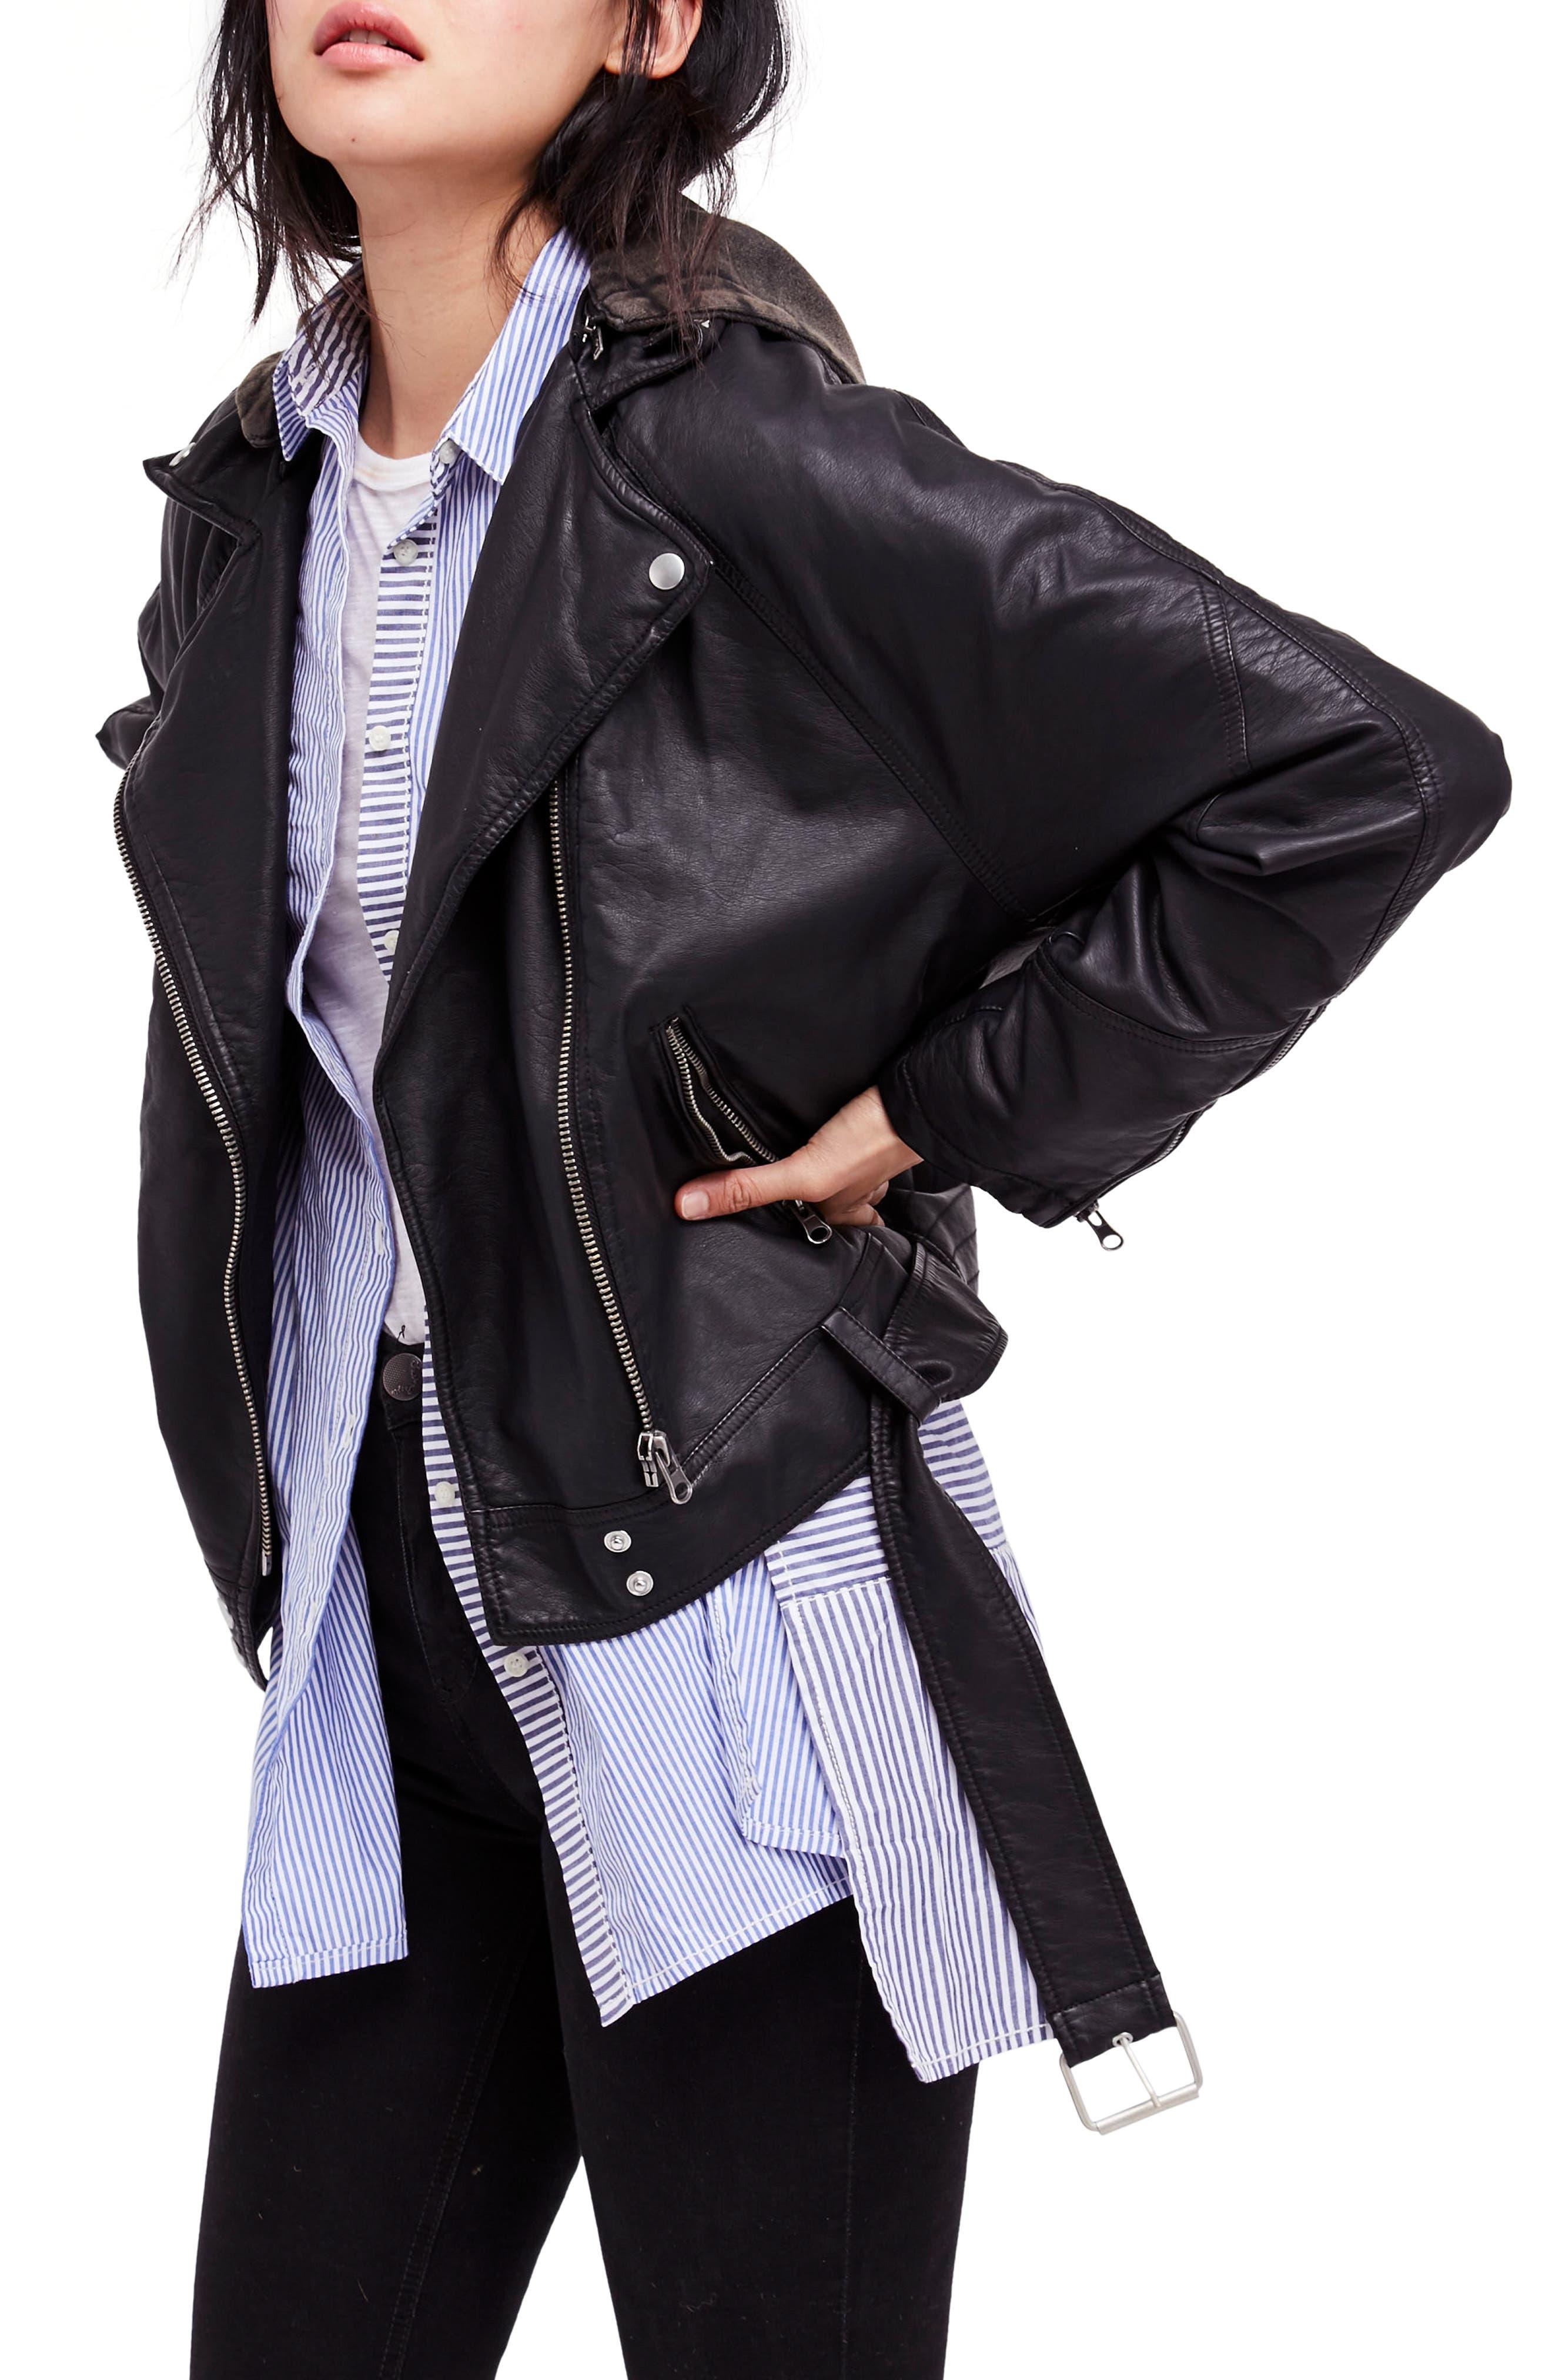 Free People Drapey Faux Leather Moto Jacket